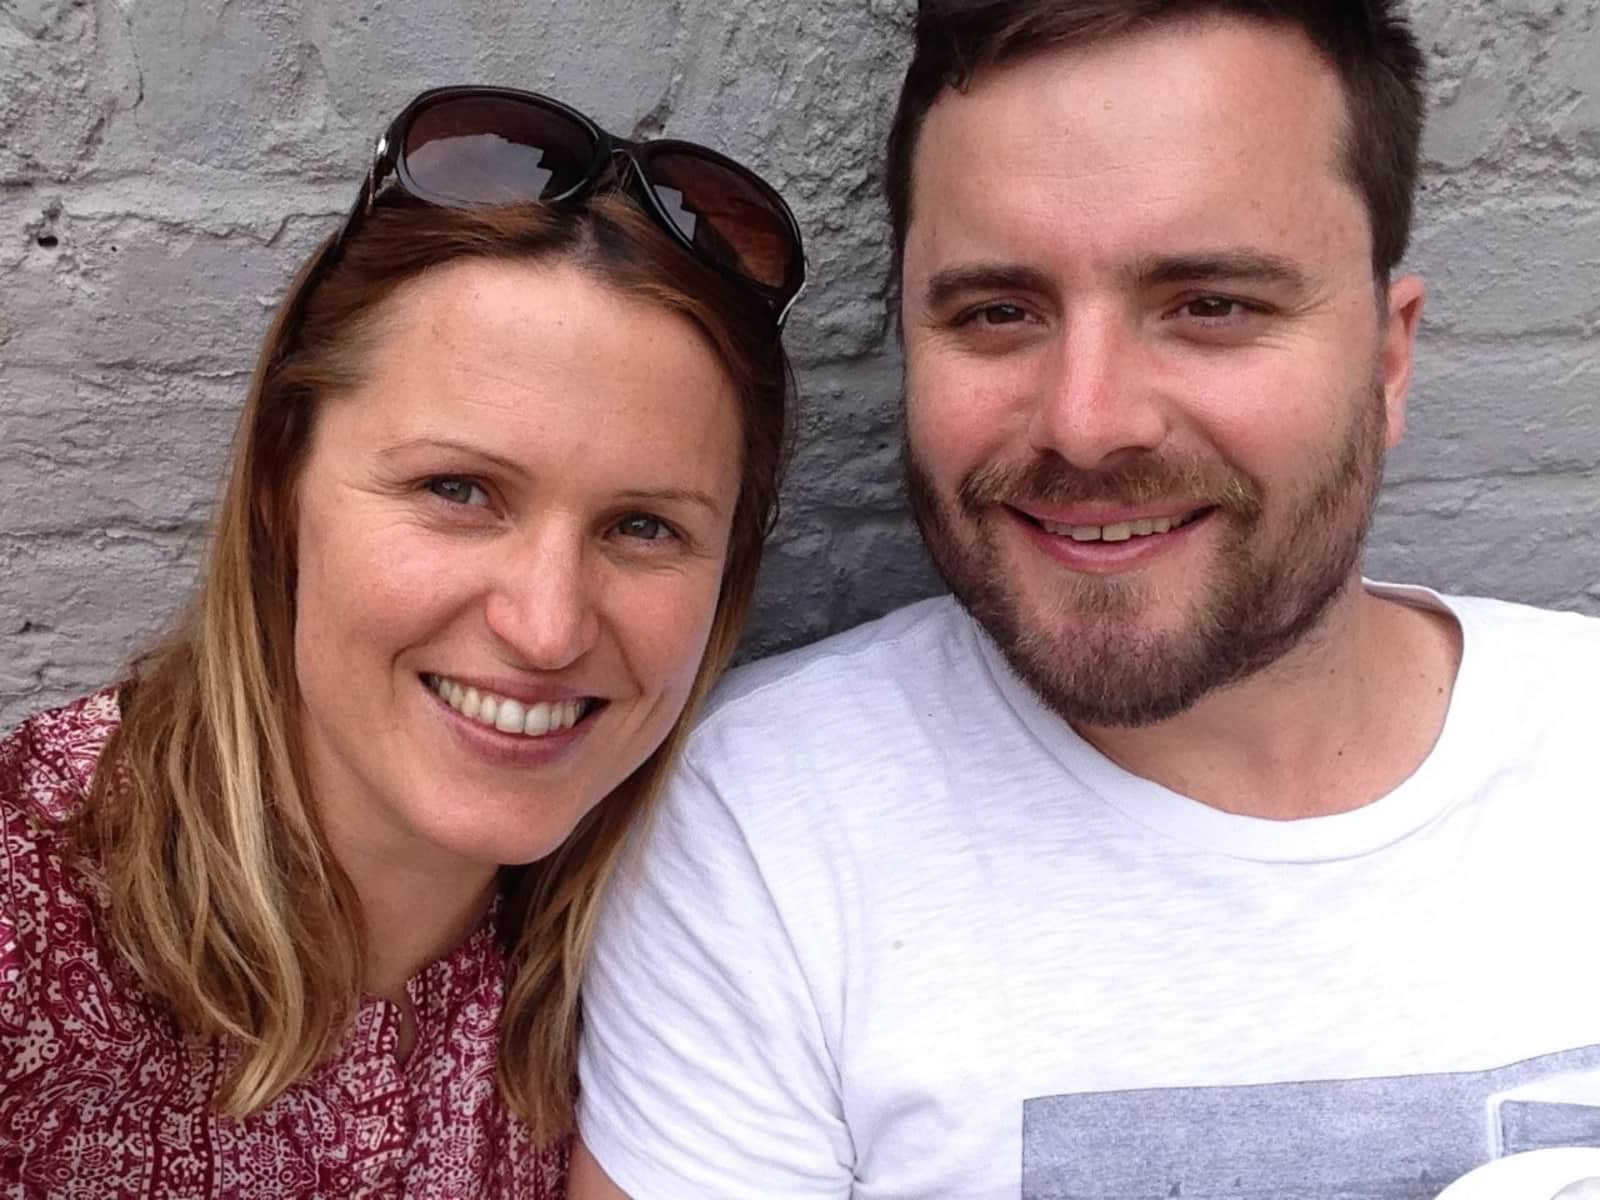 Gail & Nicholas from London, United Kingdom